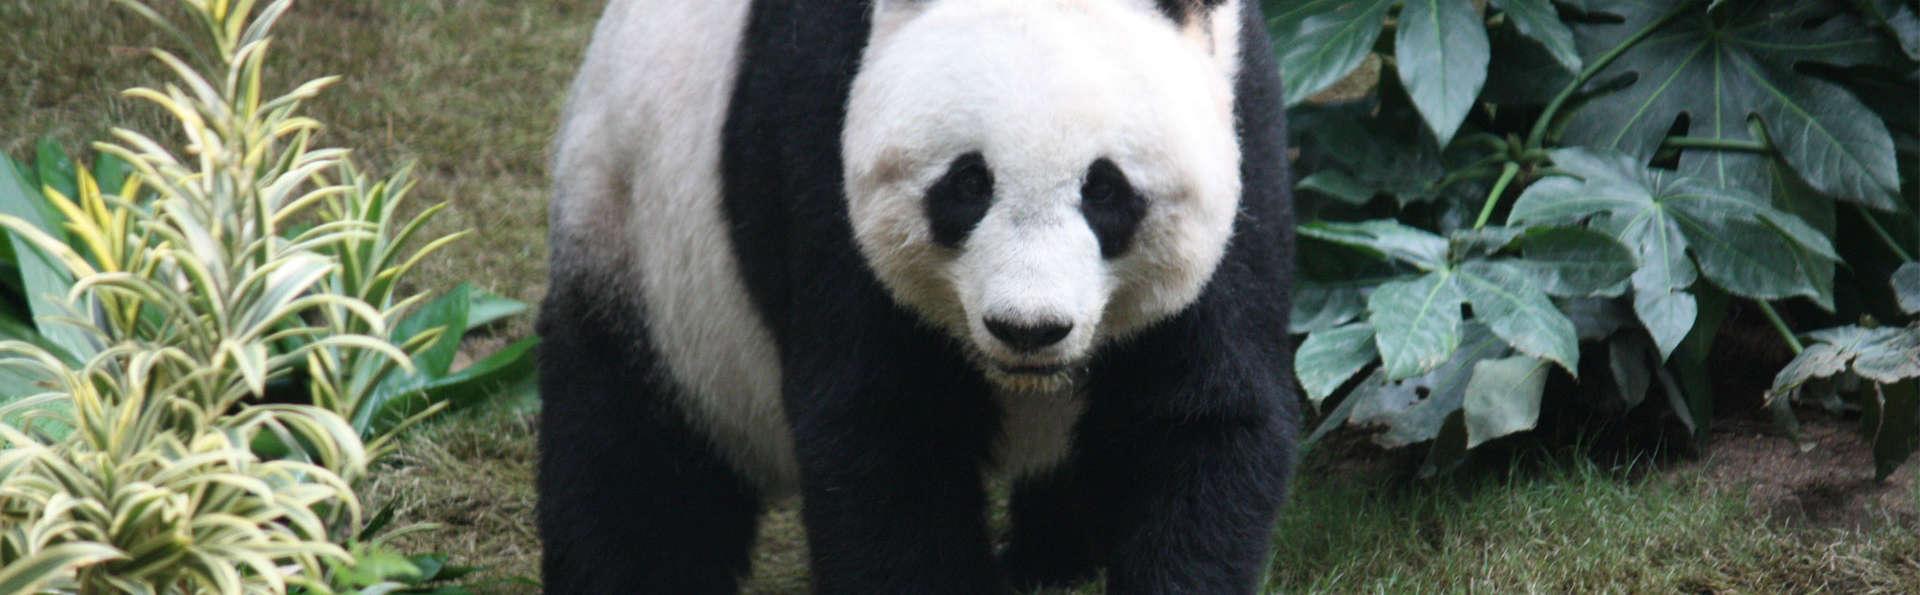 Week-end avec accès à Adventurous Ouwehand Zoo